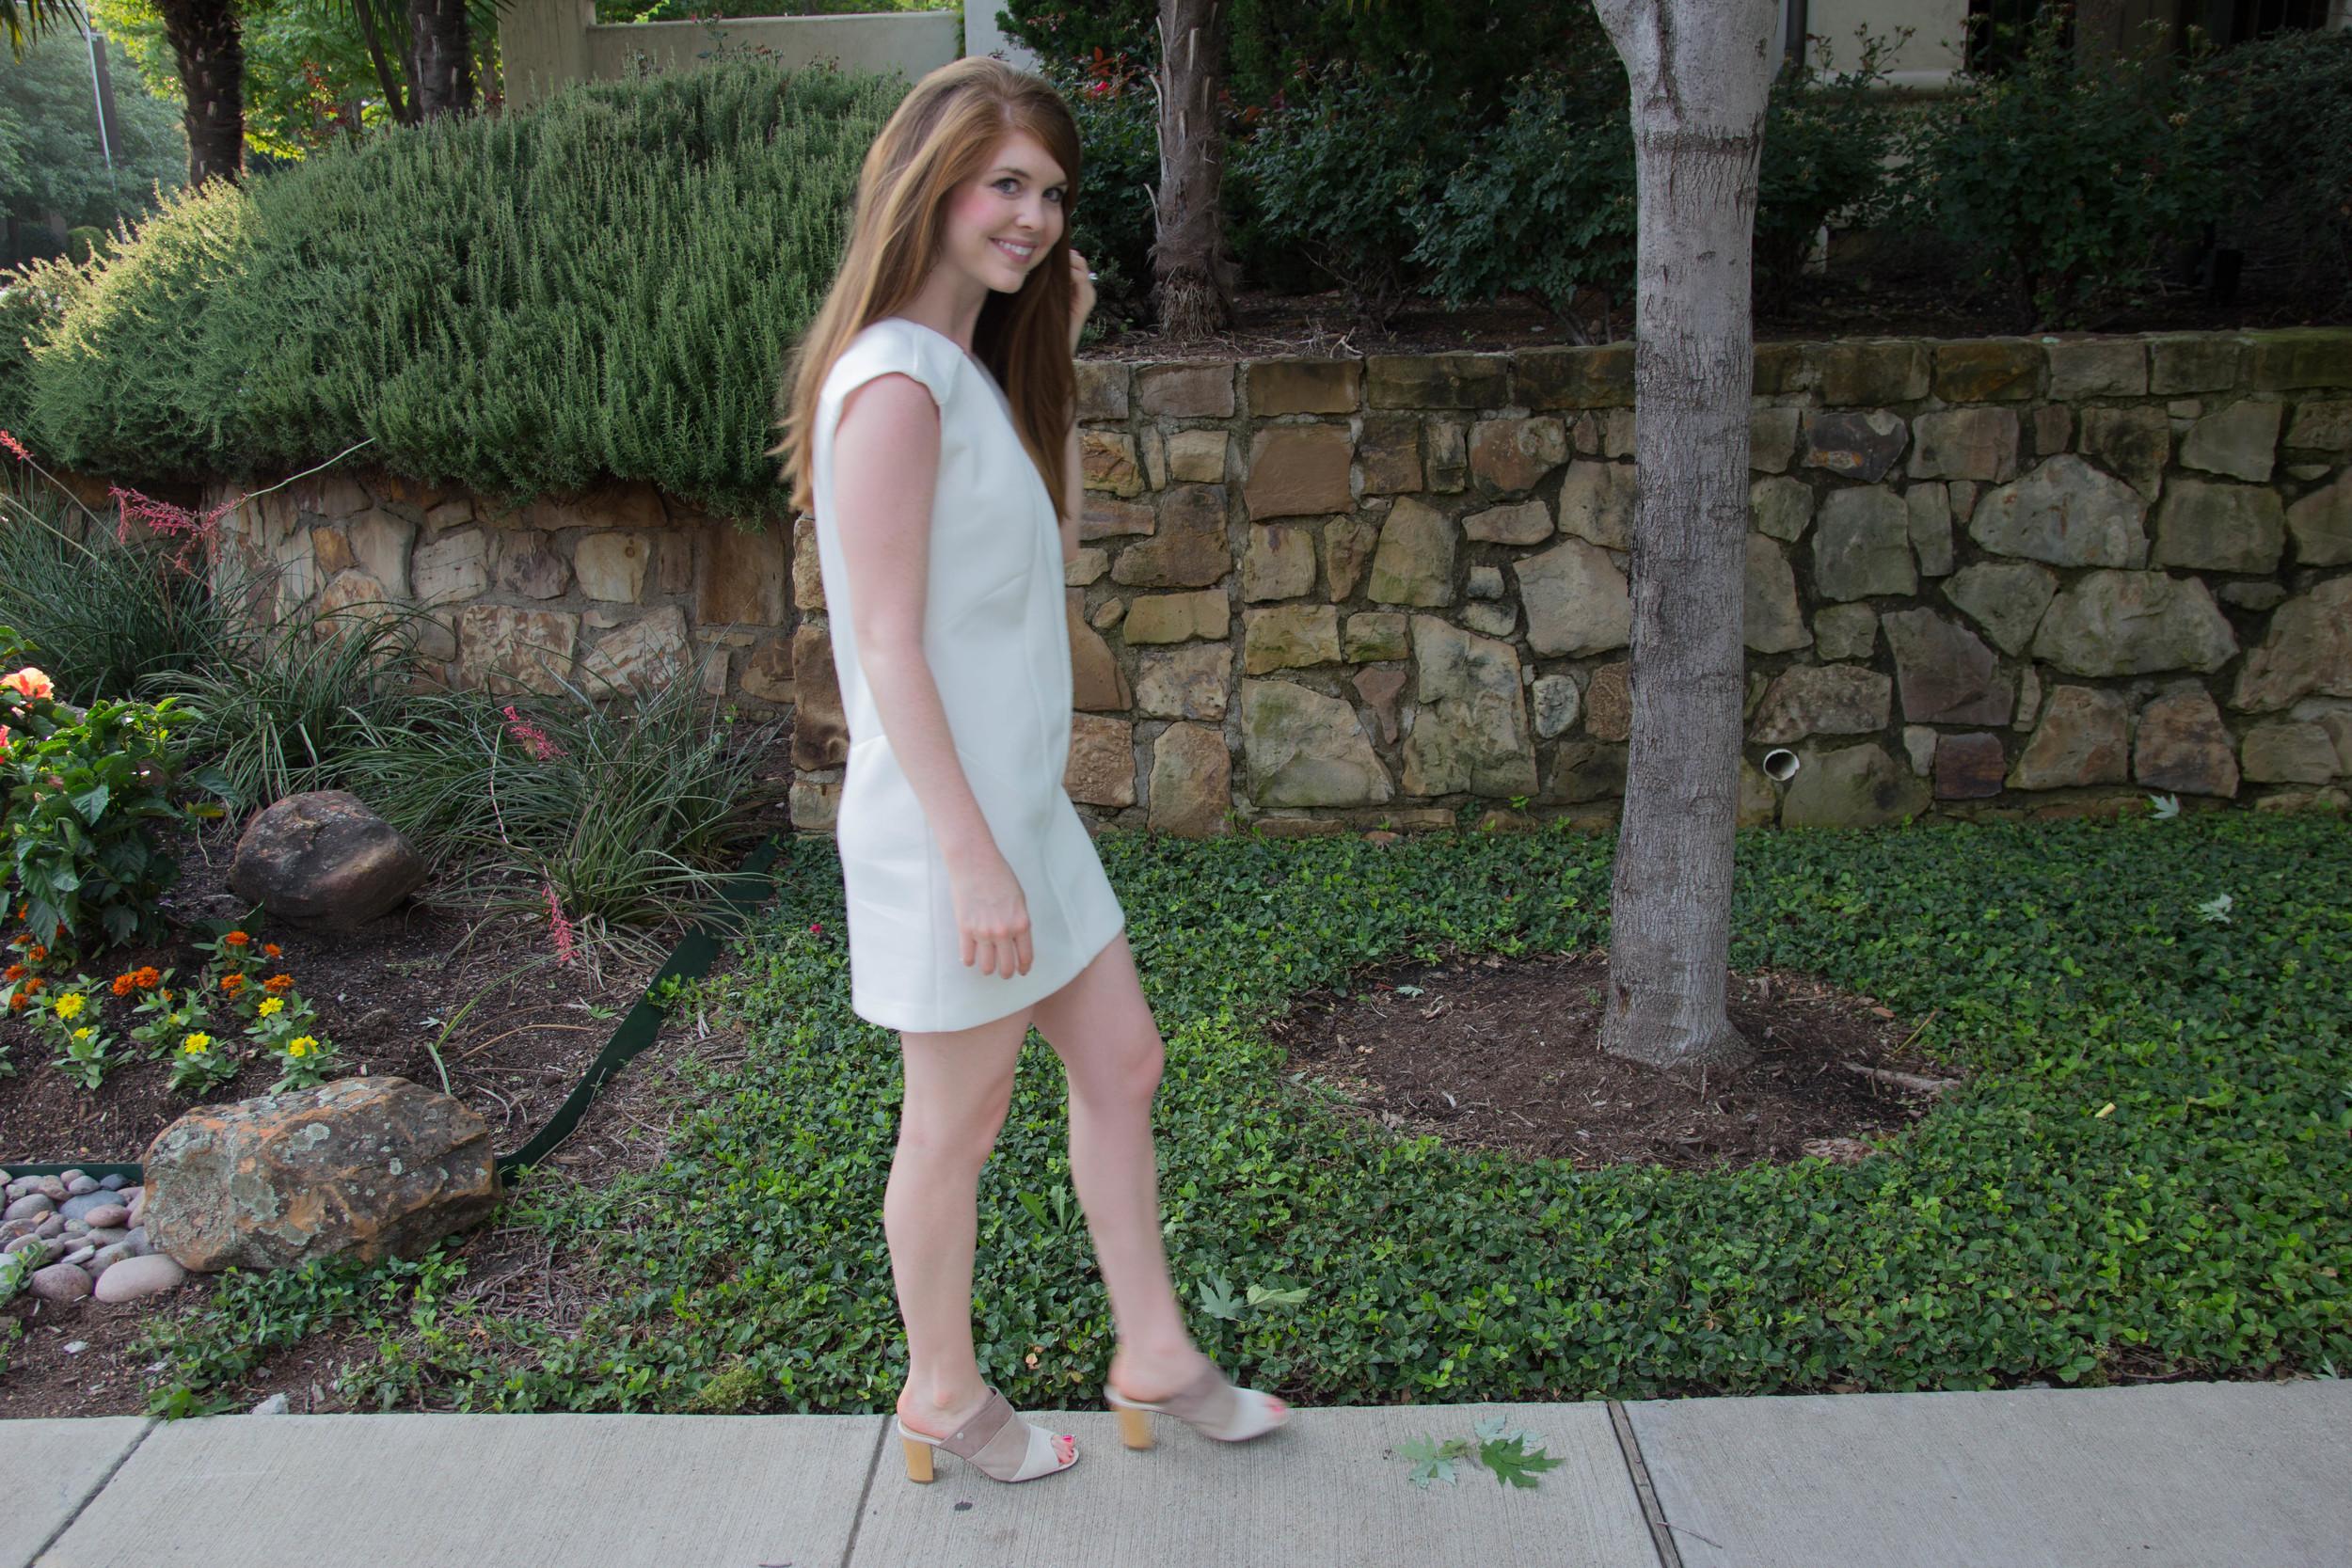 cultro dumbo white dress, scuba dress, how to wear white when you're pale, hush puppies suede slides, kendra scott druzy cuff, kendra scott sophee earrings